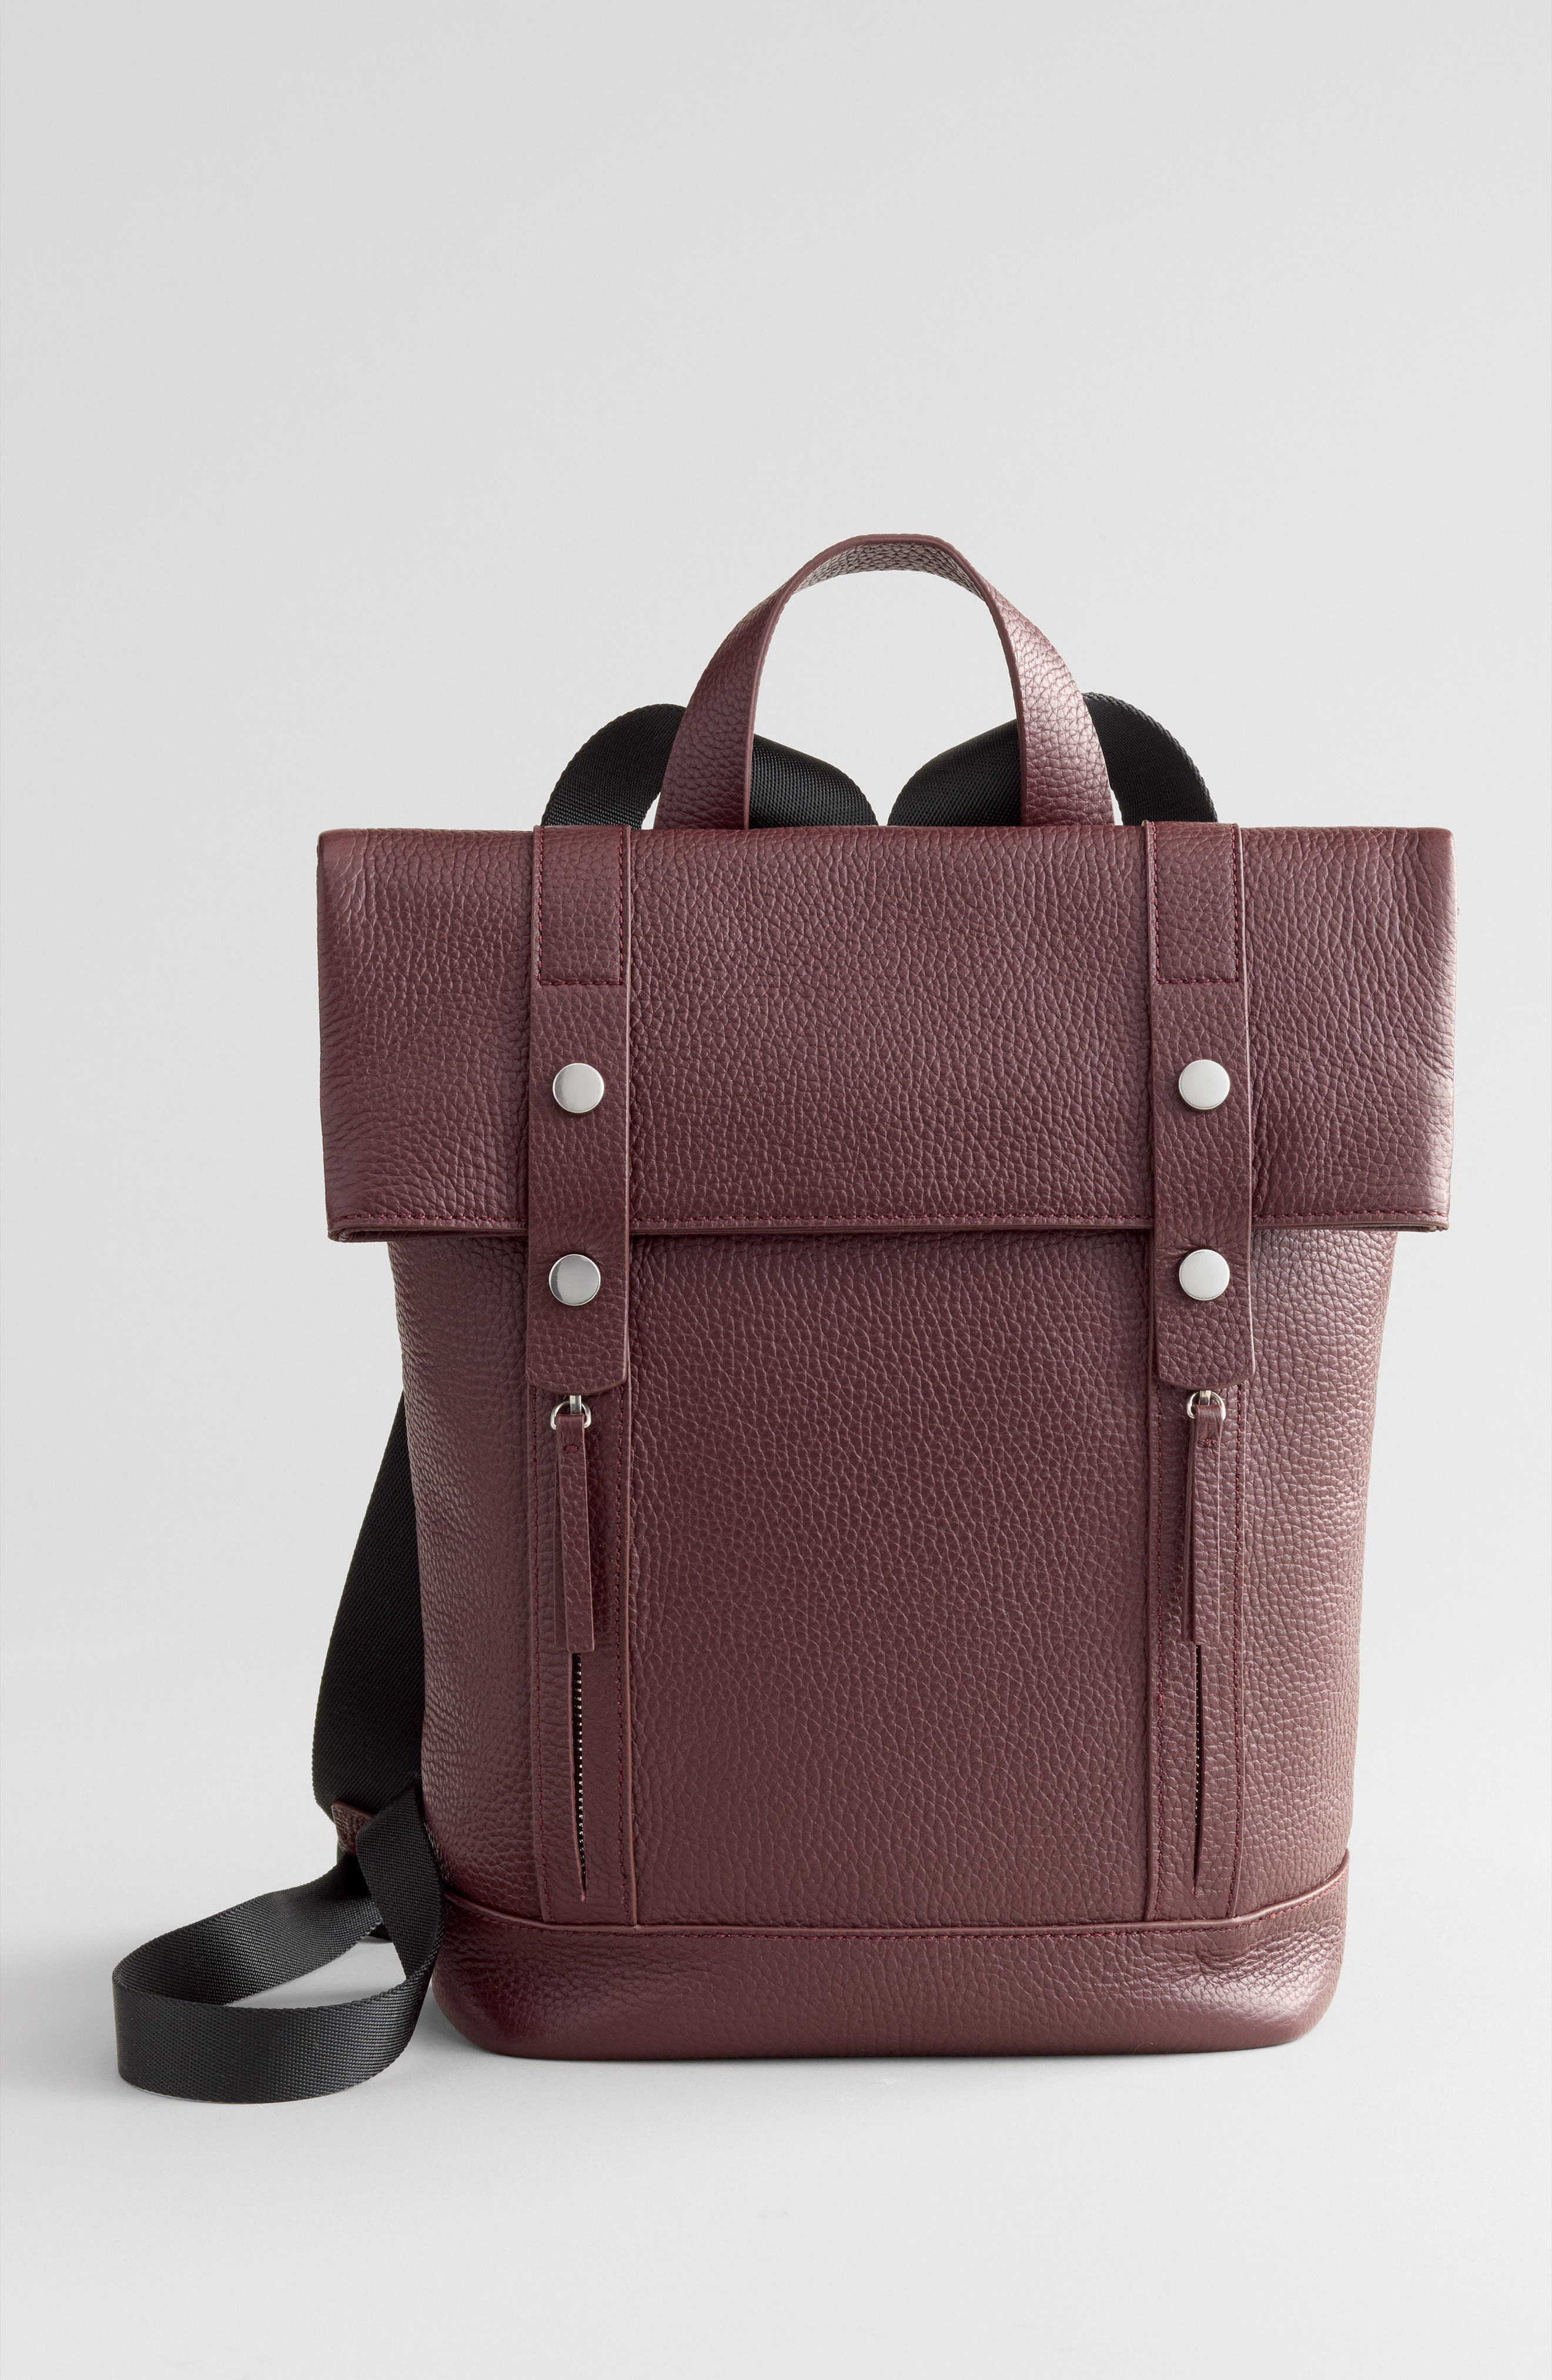 Remy Pebbled Leather Backpack,                             Alternate thumbnail 7, color,                             BURGUNDY FIG